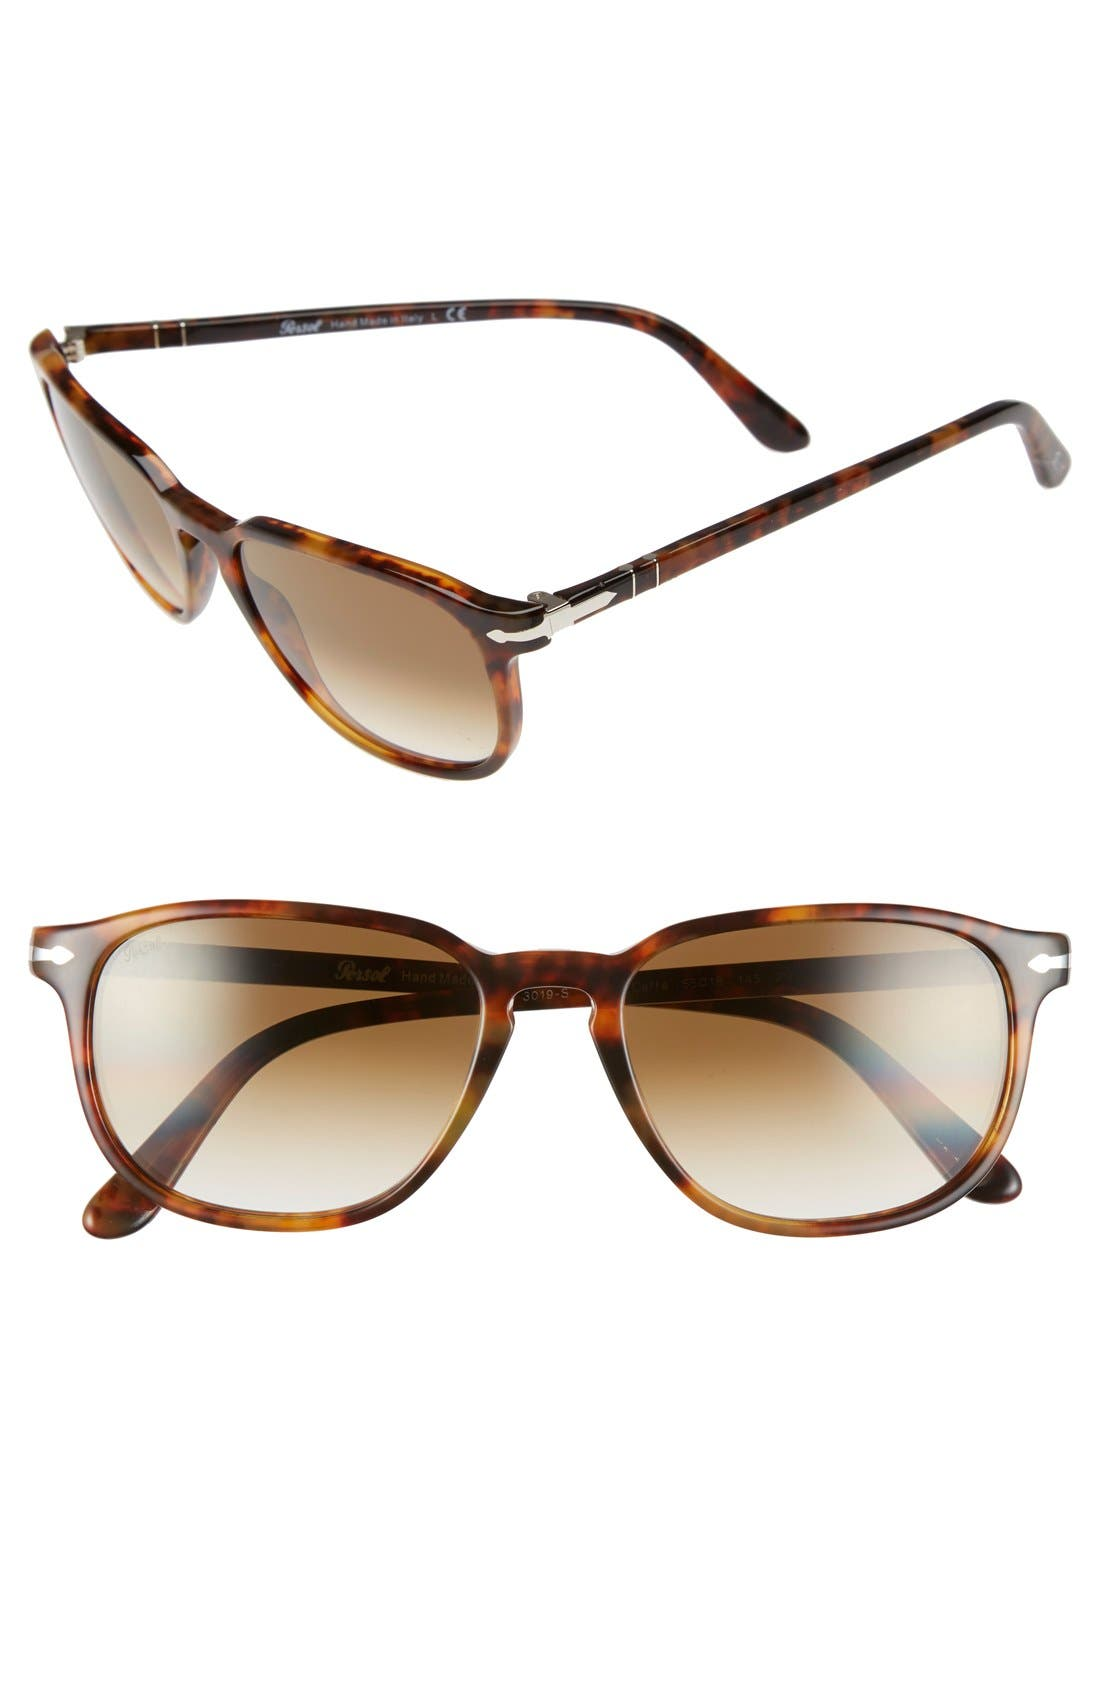 Persol 53mm Square Keyhole Sunglasses